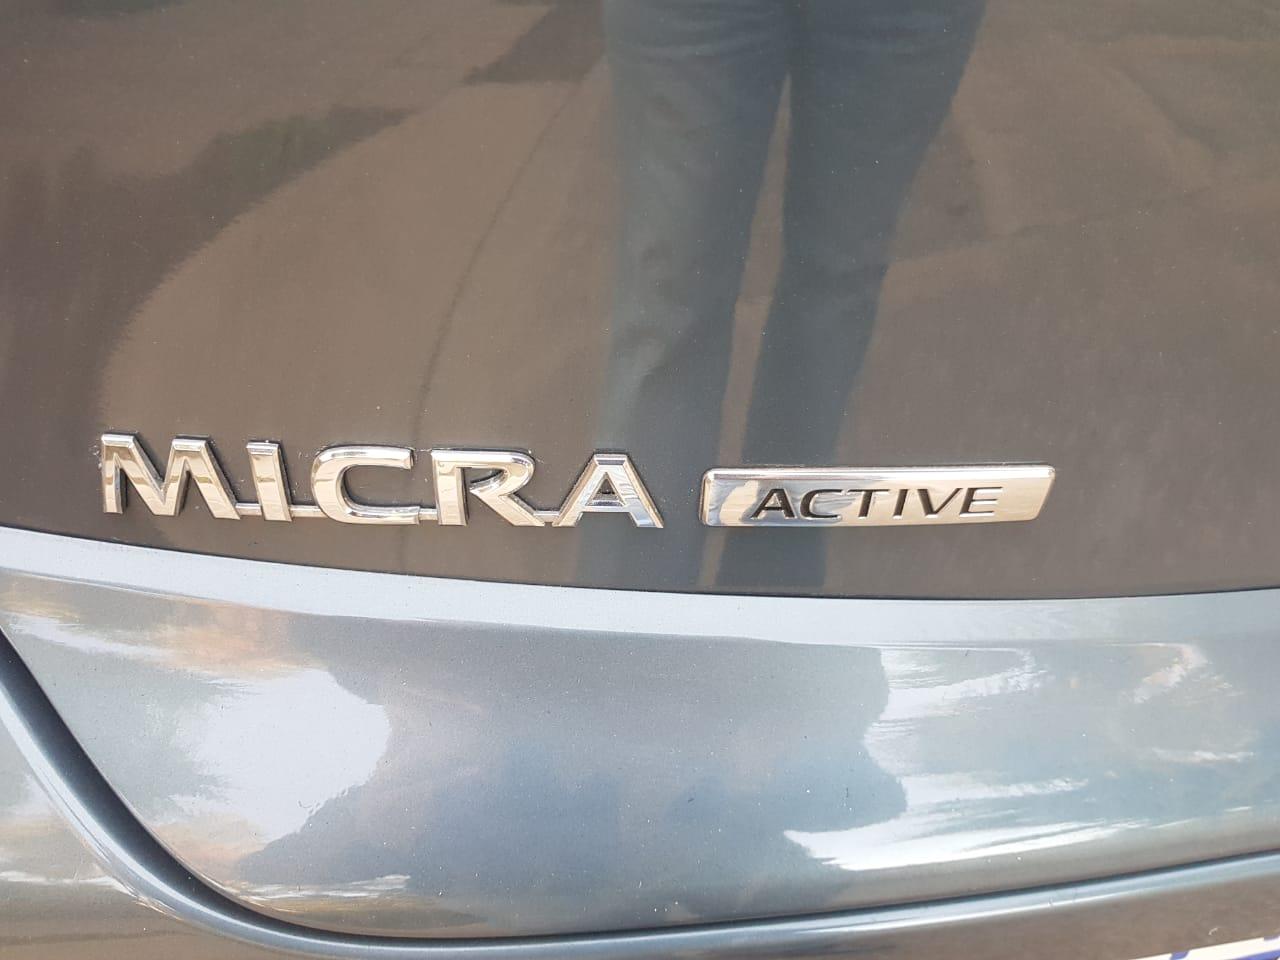 2018 Nissan Micra 1.2 Visia+